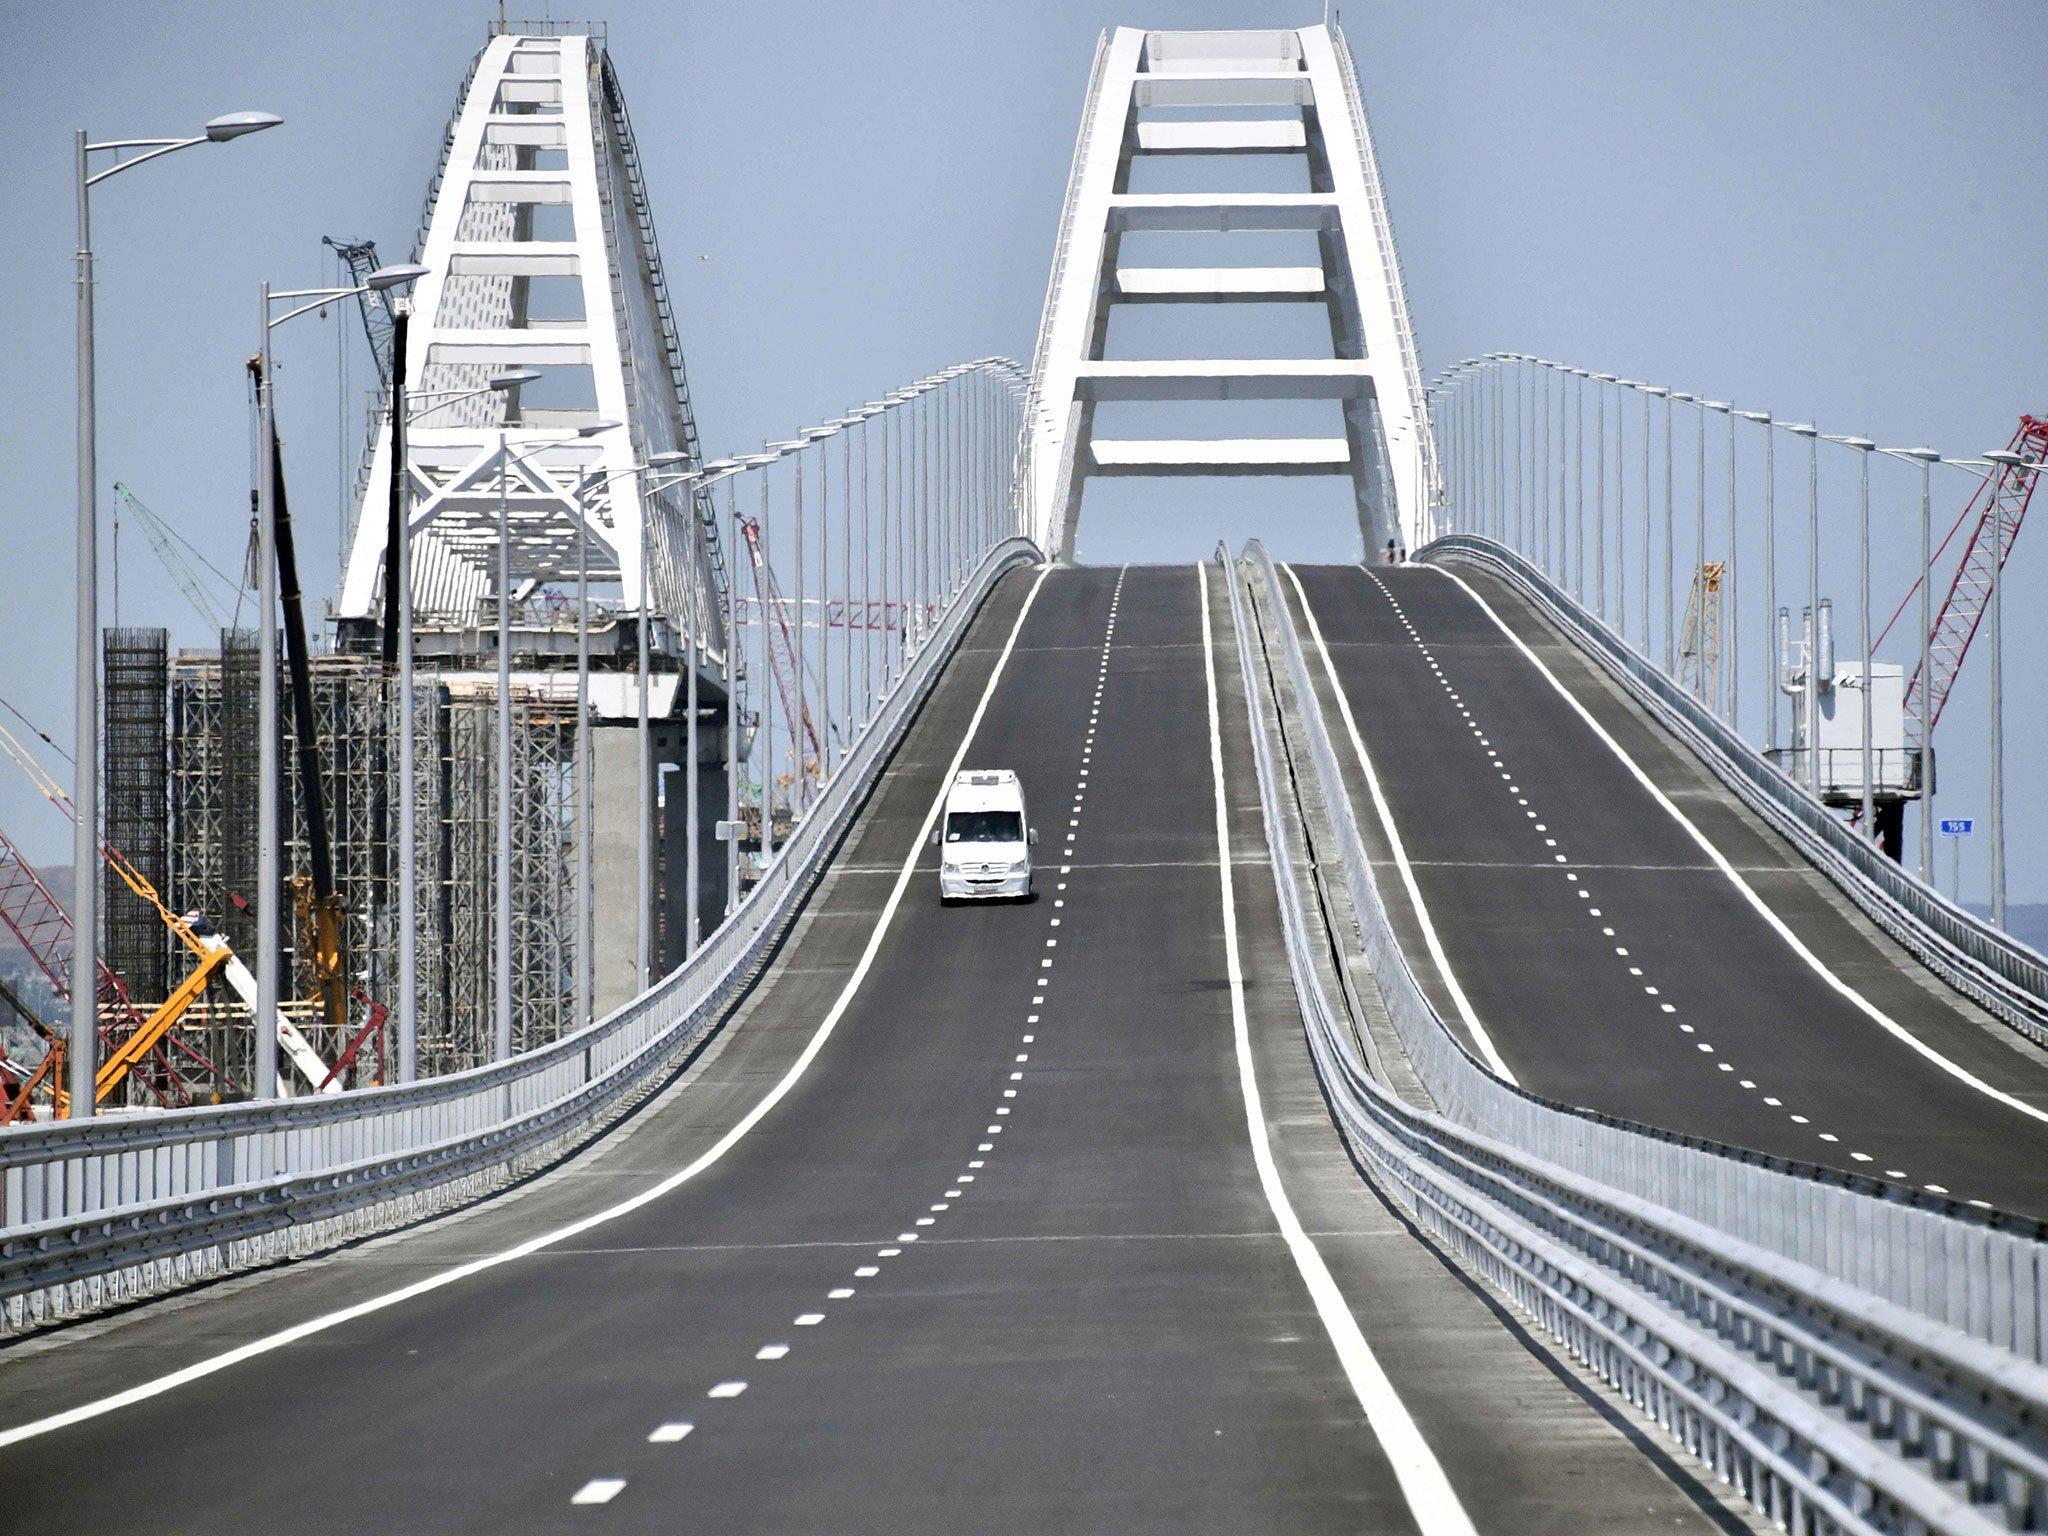 It's a real celebration!' Russia opens controversial 12-mile bridge ...